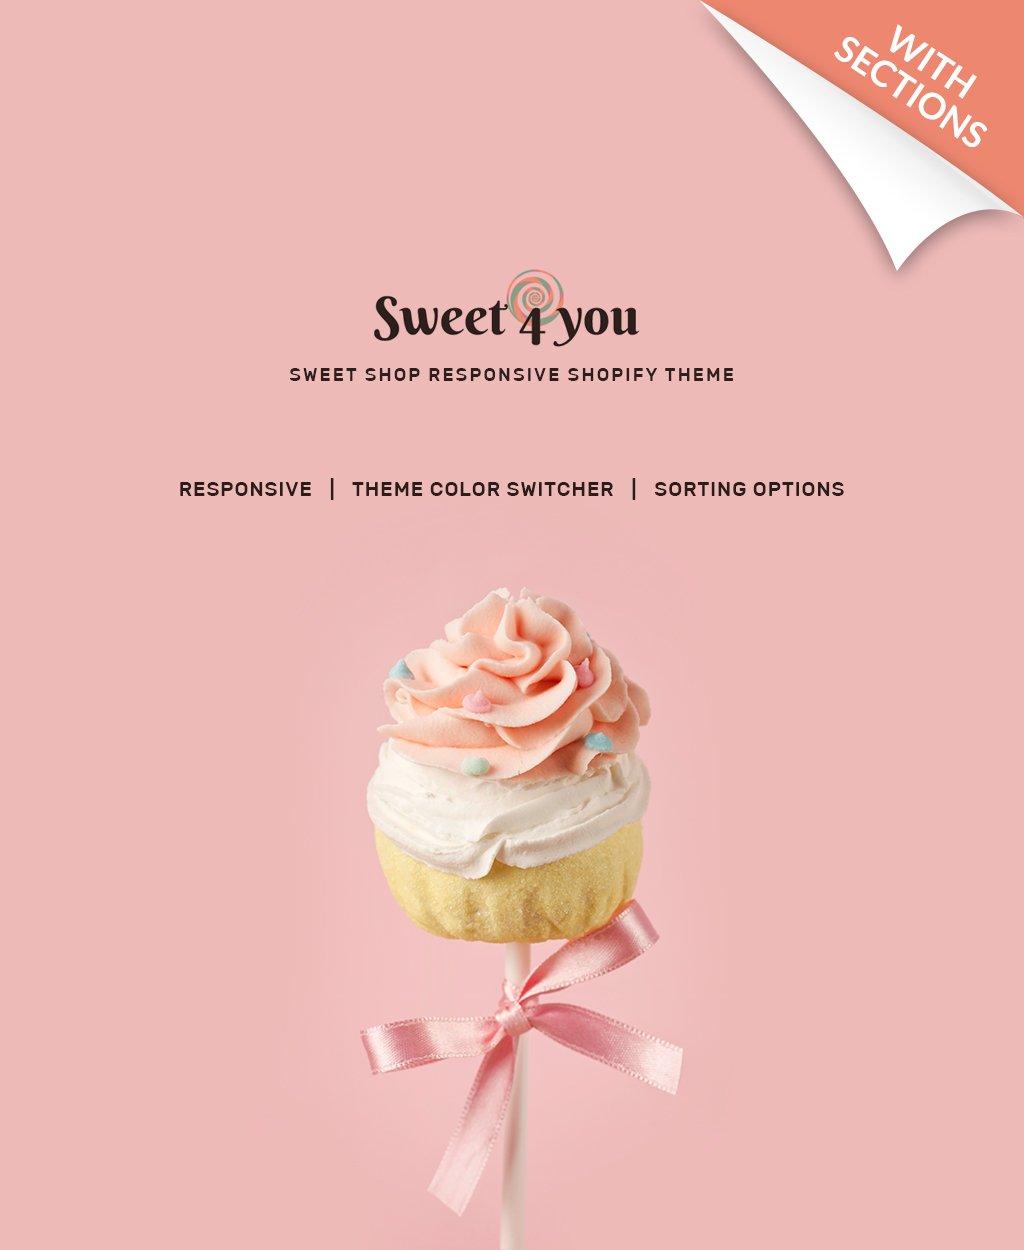 Sweet Shop Responsive Shopify Theme - screenshot